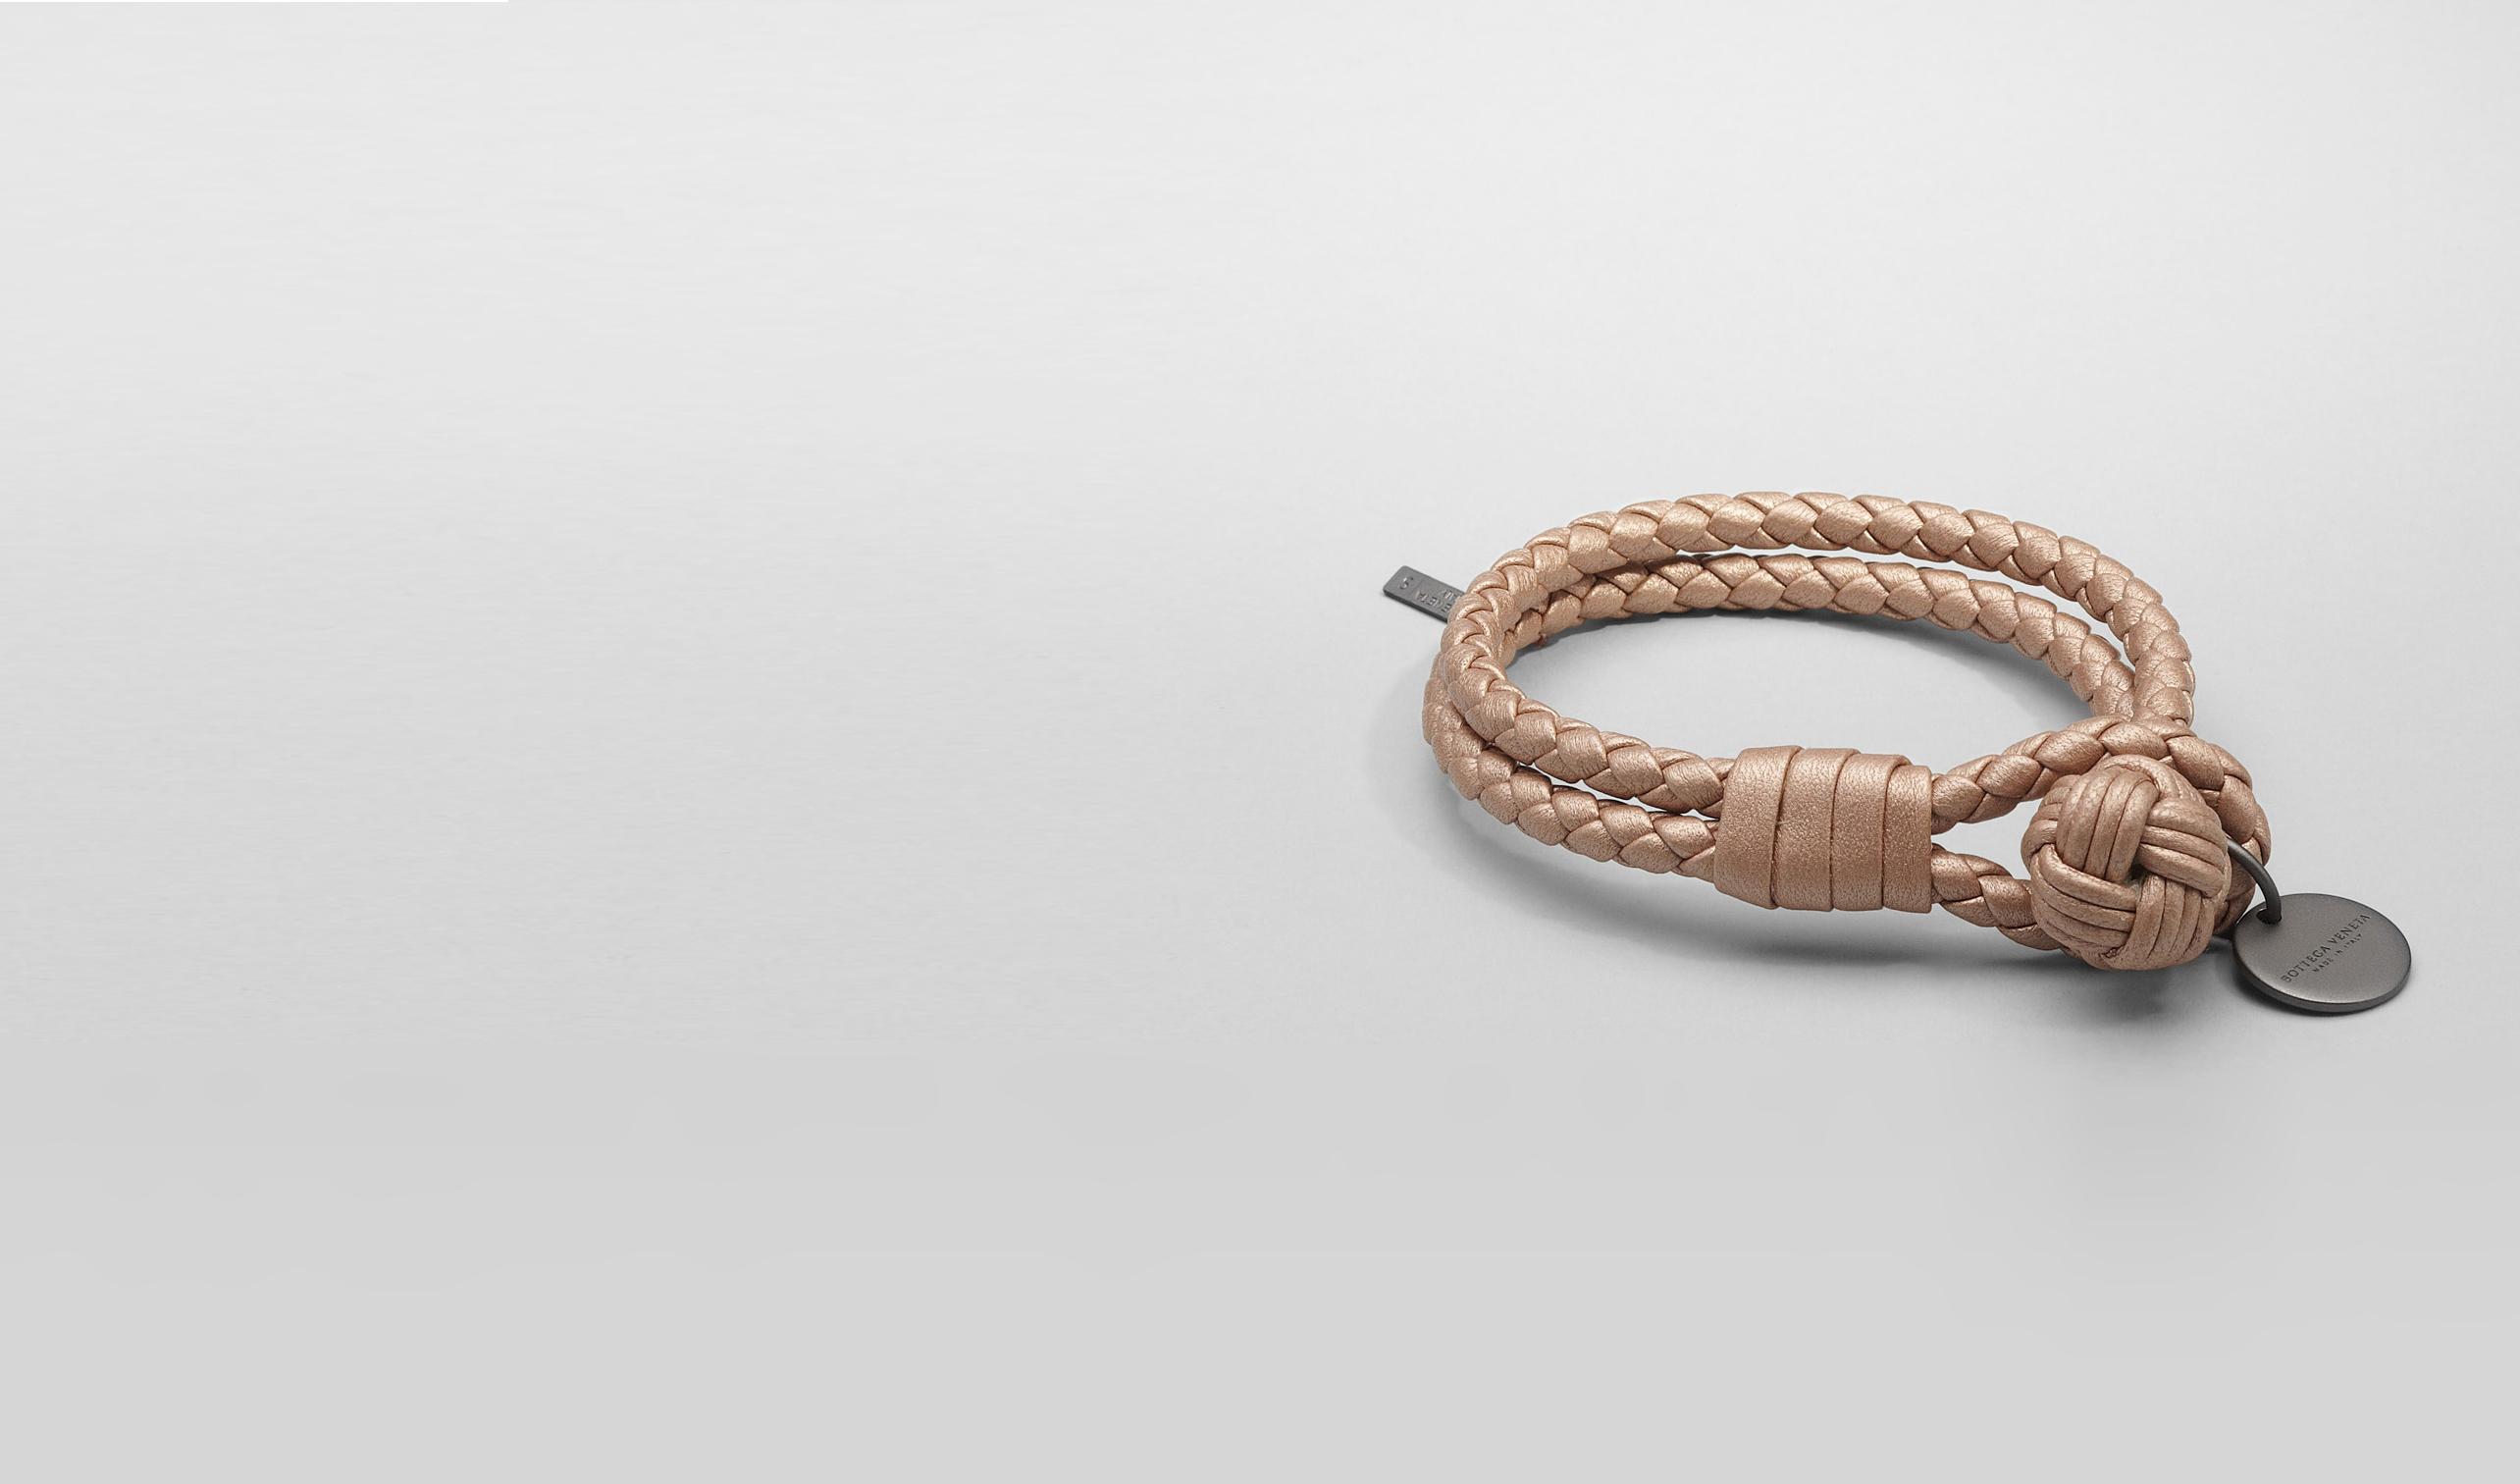 BOTTEGA VENETA Schlüsselring oder Armband D Armband aus NAPPALEDER INTRECCIATO METALLIZZATO RAME MET pl